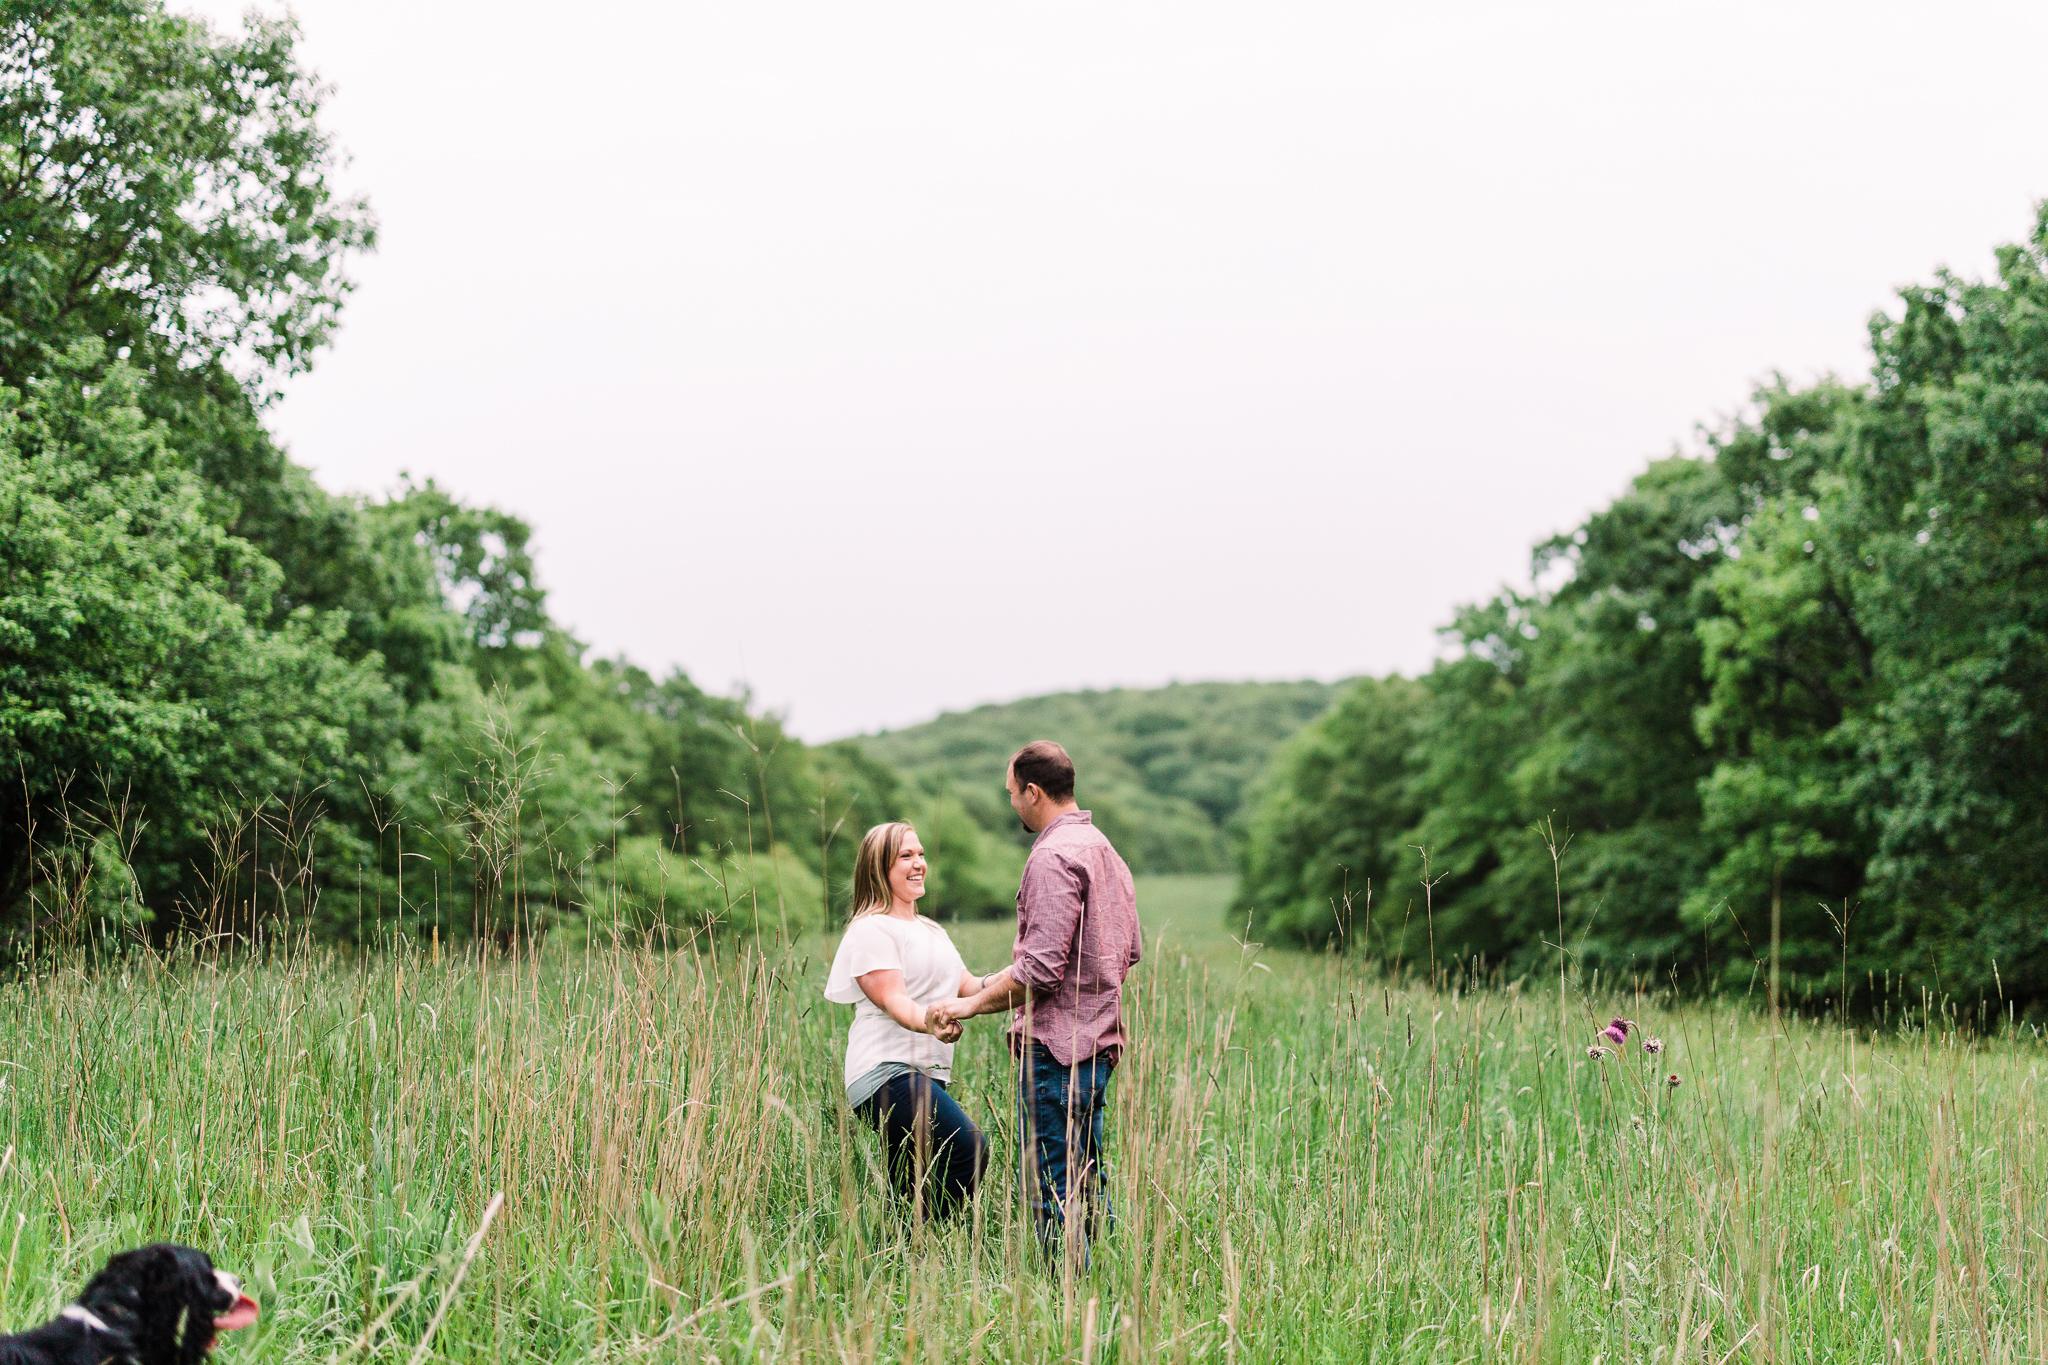 Kettle-creek-state-park-engagement-9362.jpg